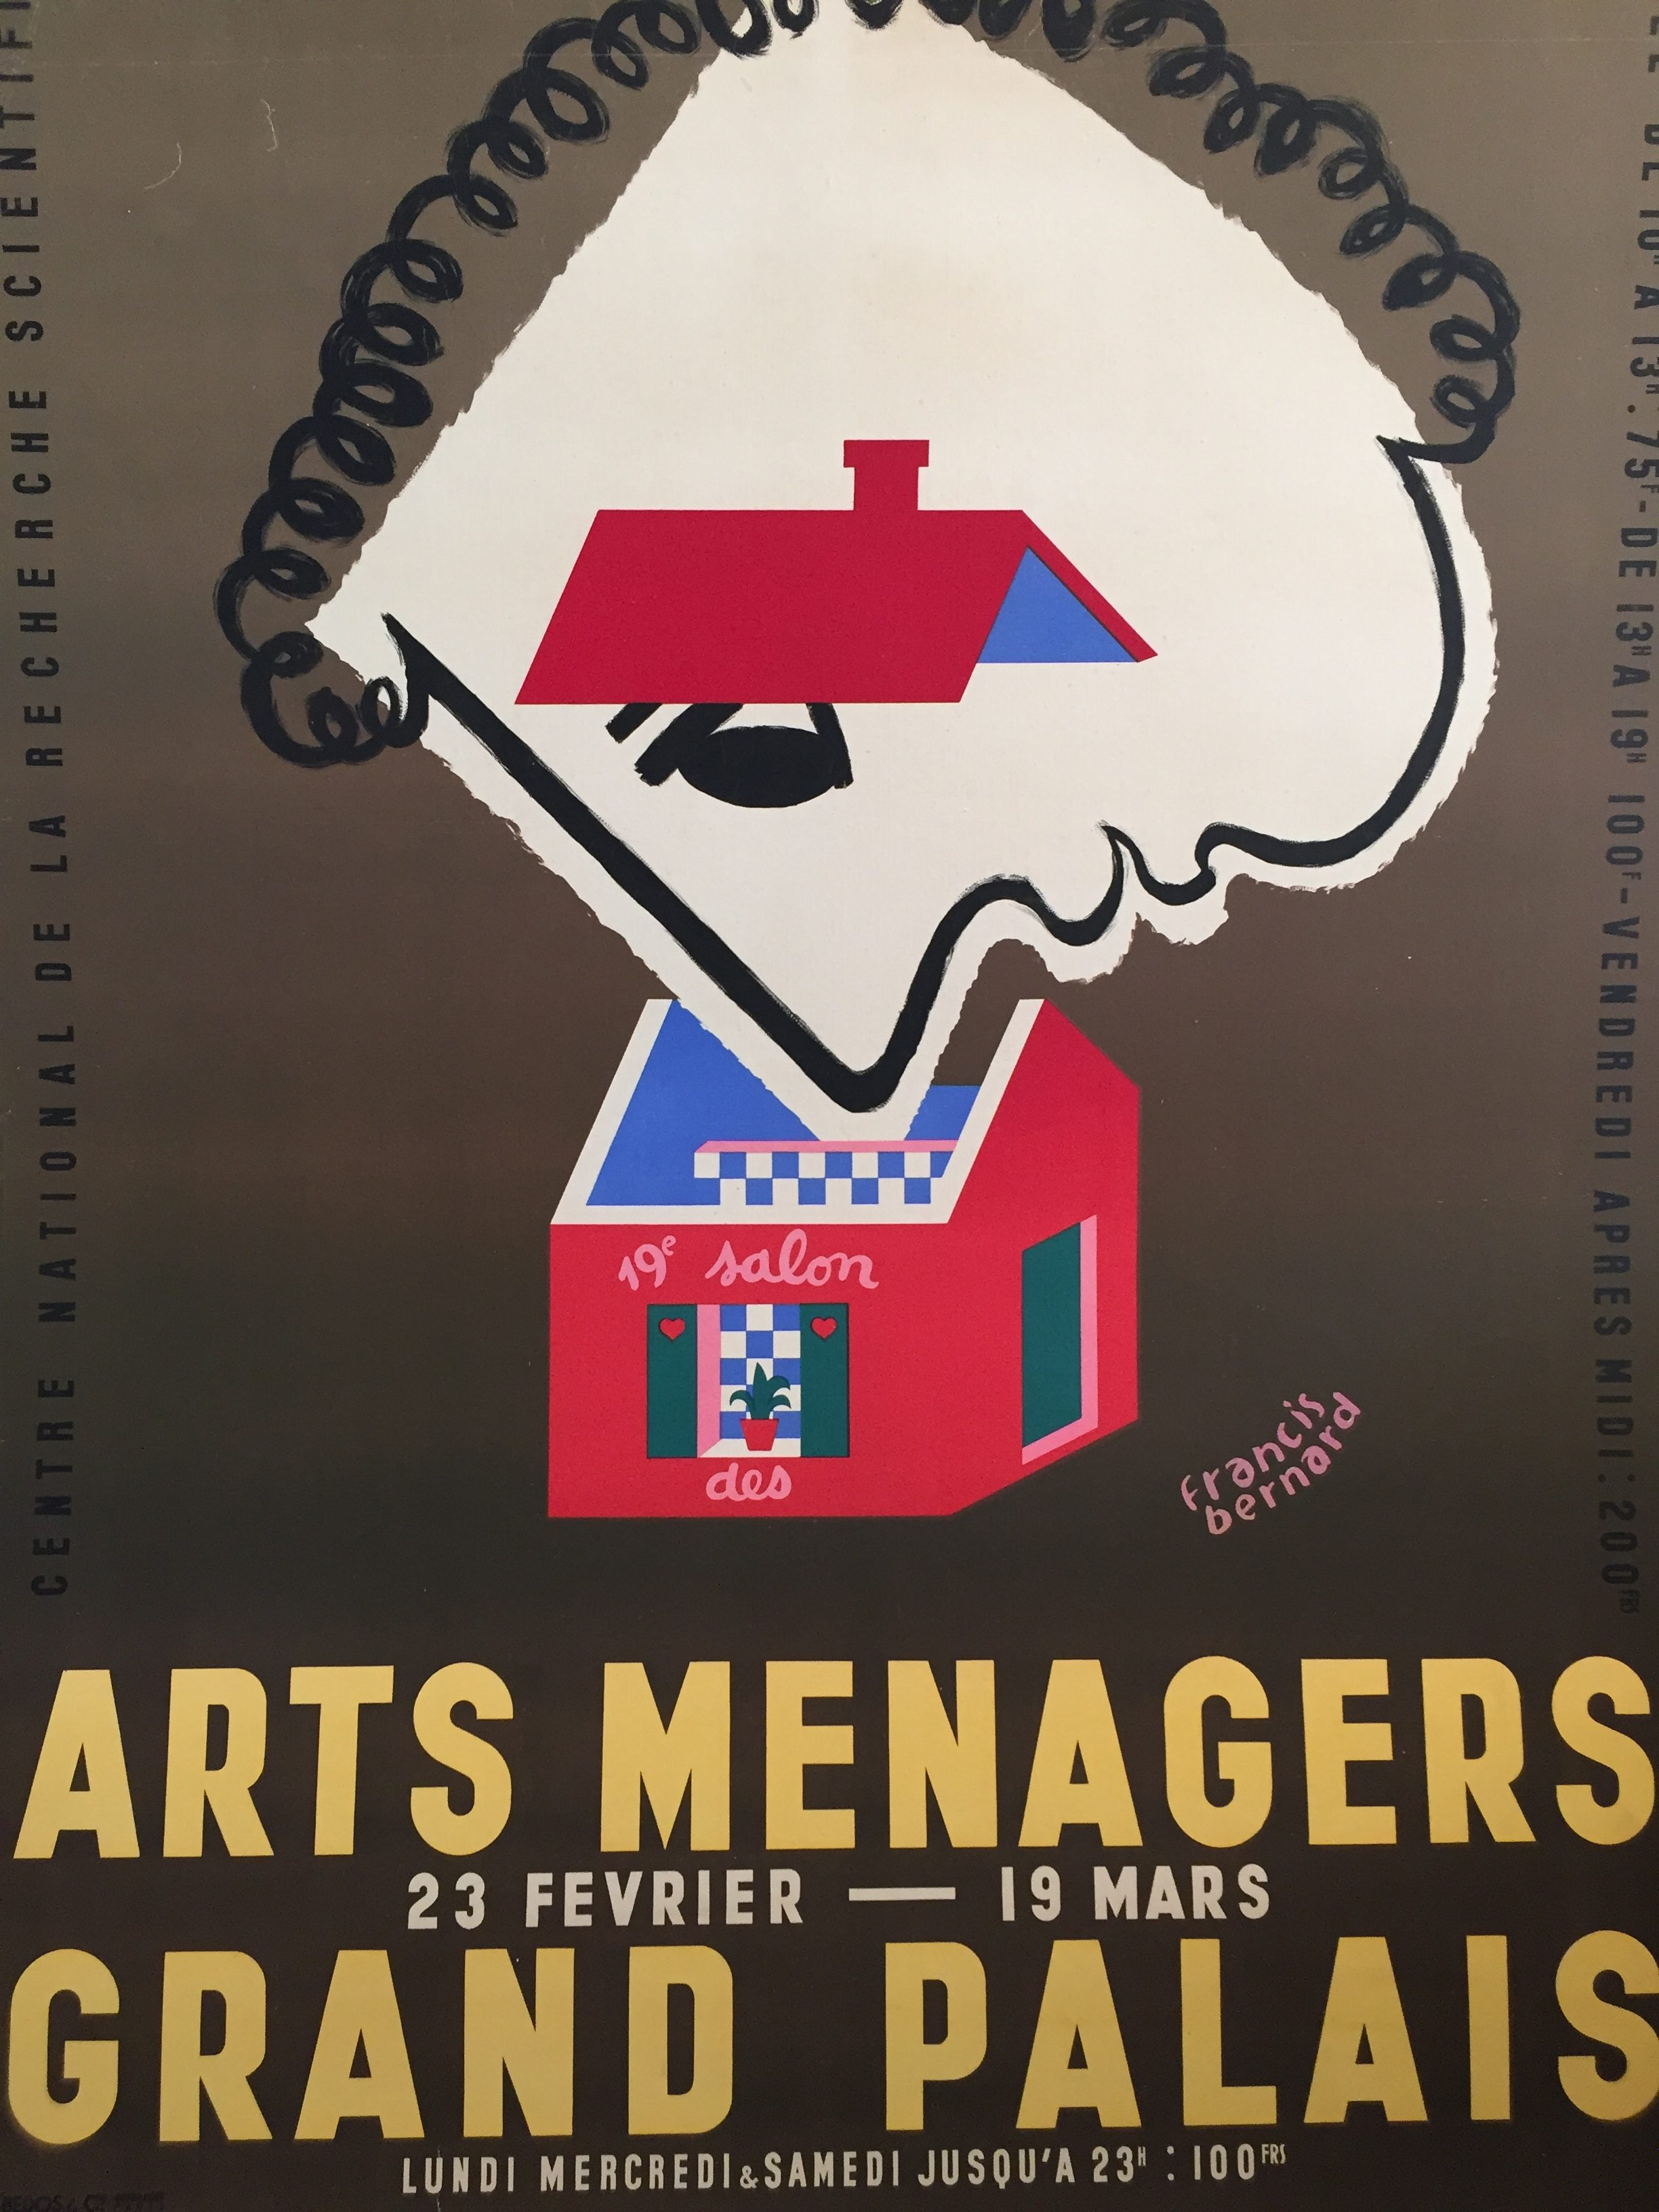 Arts Menagers Grand Palais Original Vintage Poster